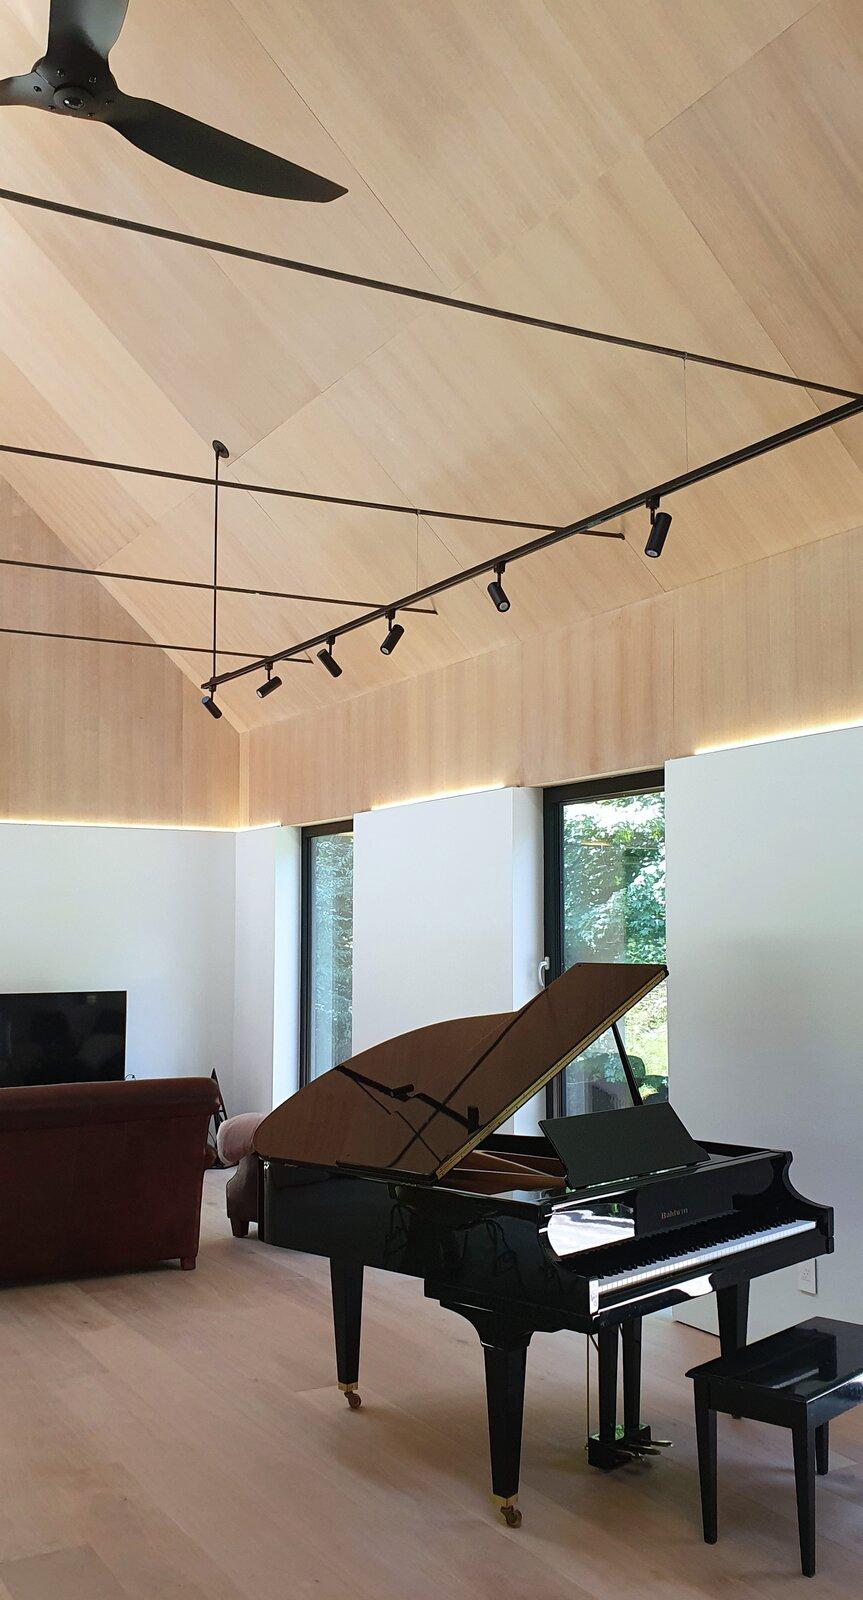 Living Room, Track Lighting, Pendant Lighting, Light Hardwood Floor, Sofa, Bench, Accent Lighting, and Plywood Floor Great Room Piano  Cork Haven by Multitude Studio